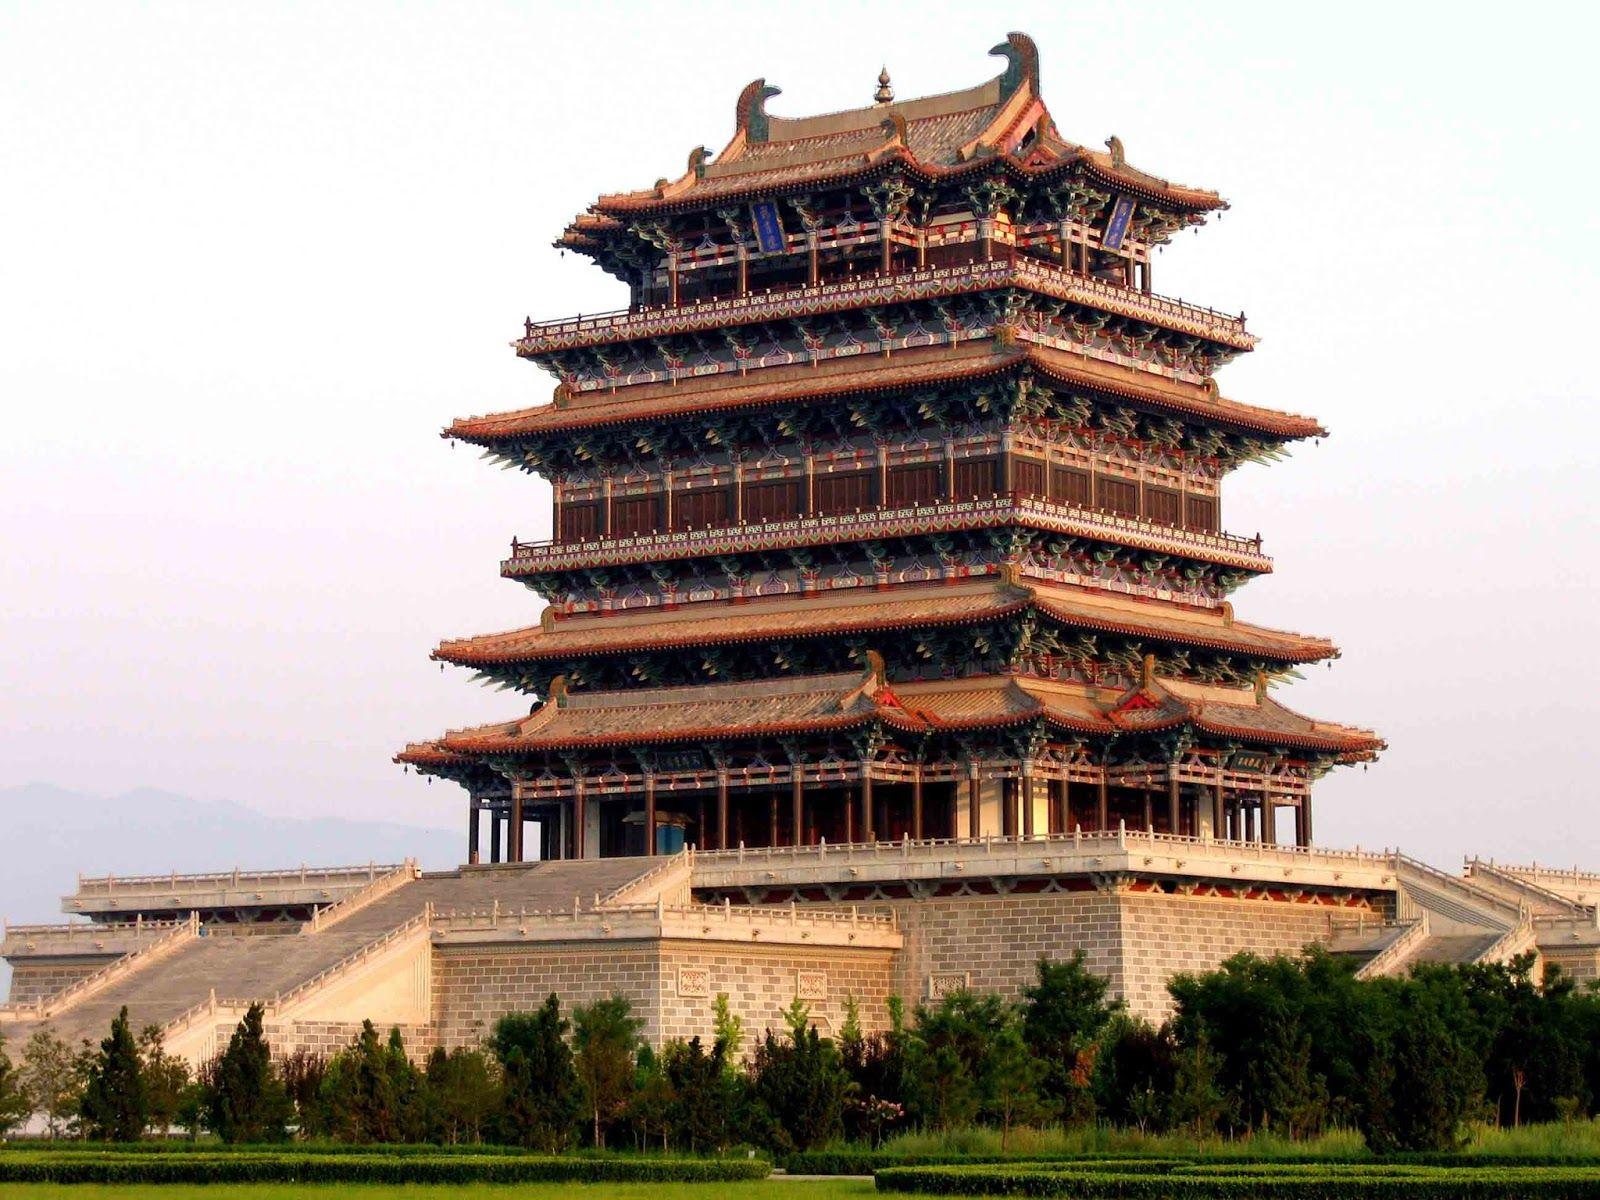 Asian Architecture Google Search Asian Architecture Ancient Architecture Architecture